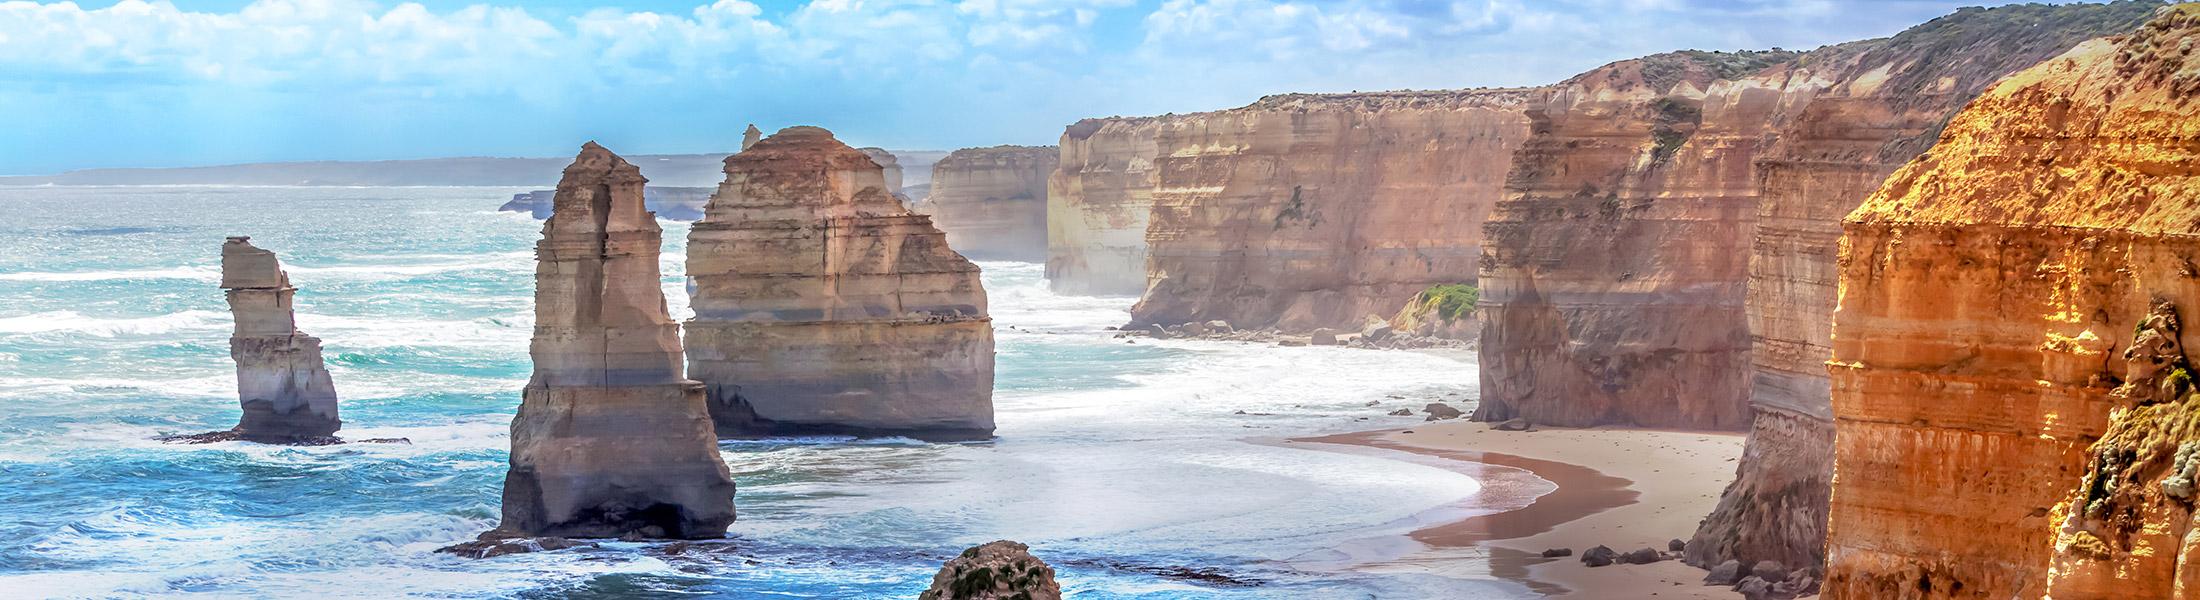 The Twelve Apostles on the Great Ocean Road in Australia